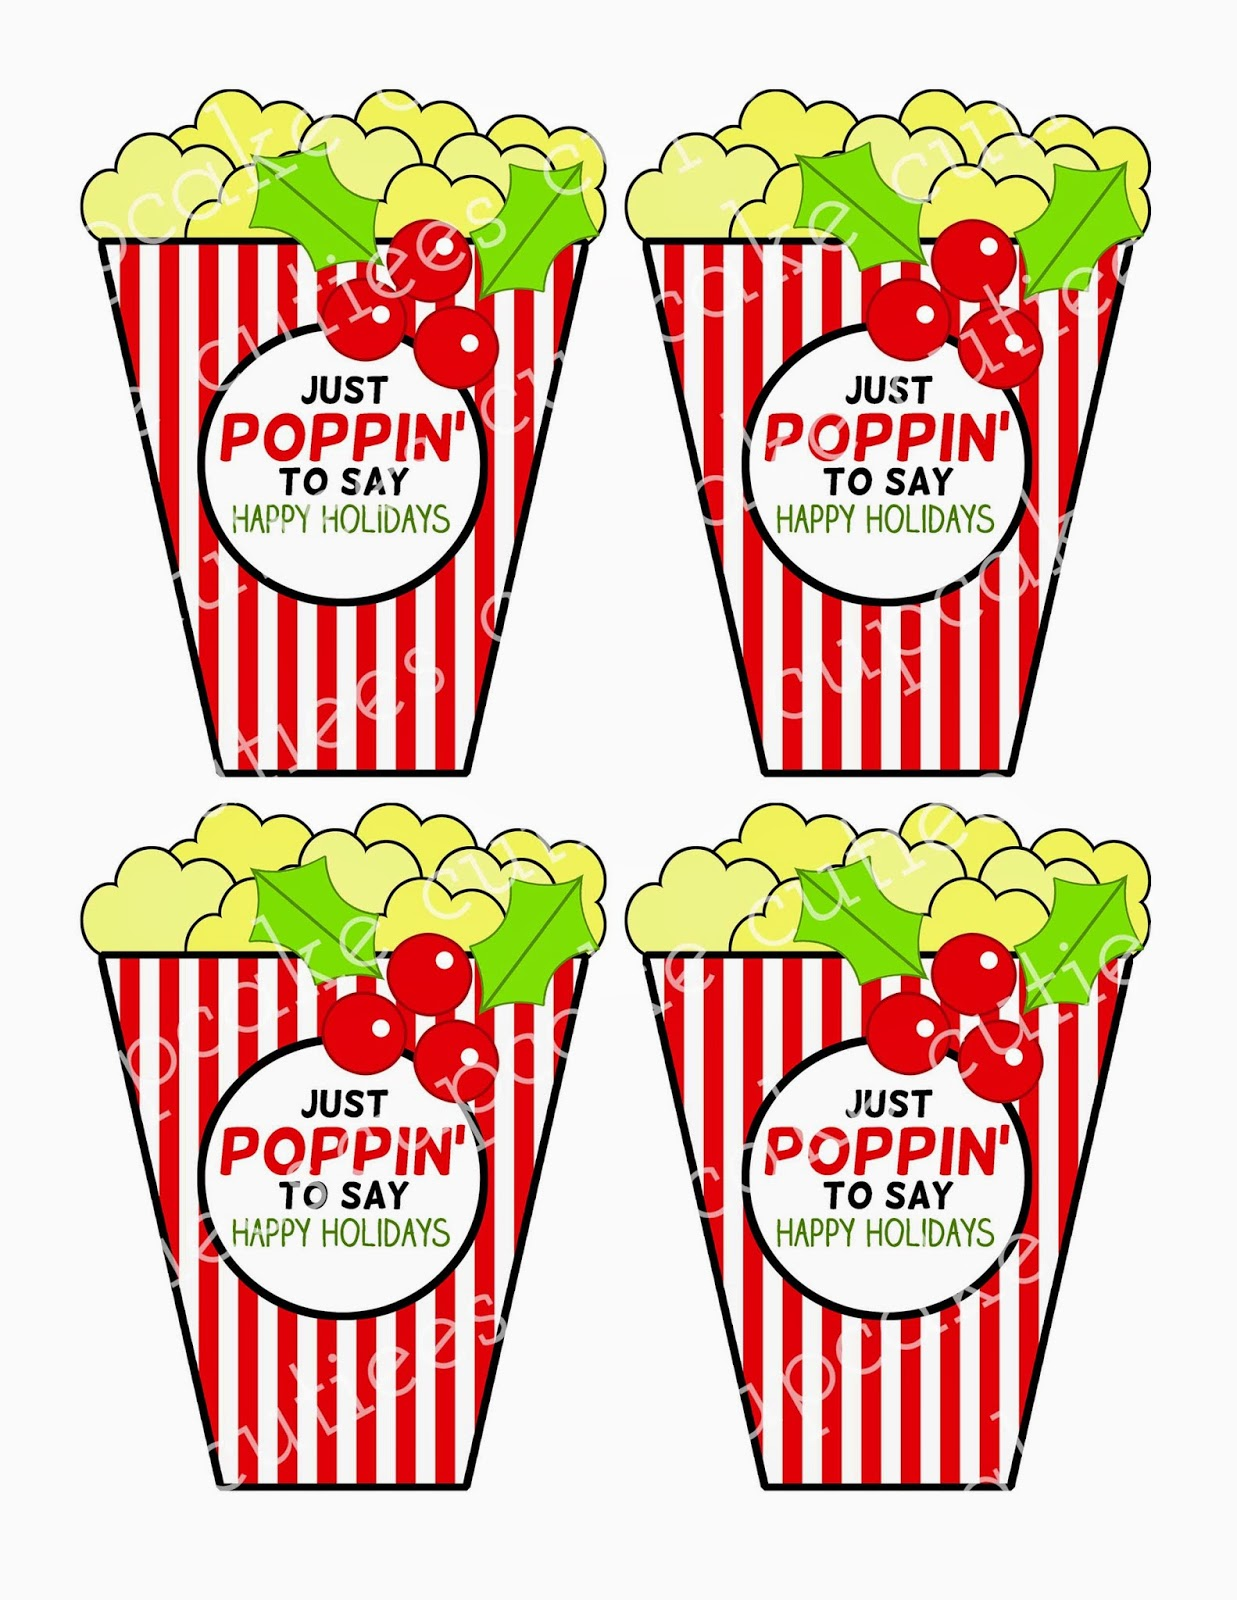 Holydays clipart popcorn Popcorn Cut Cupcake www Love